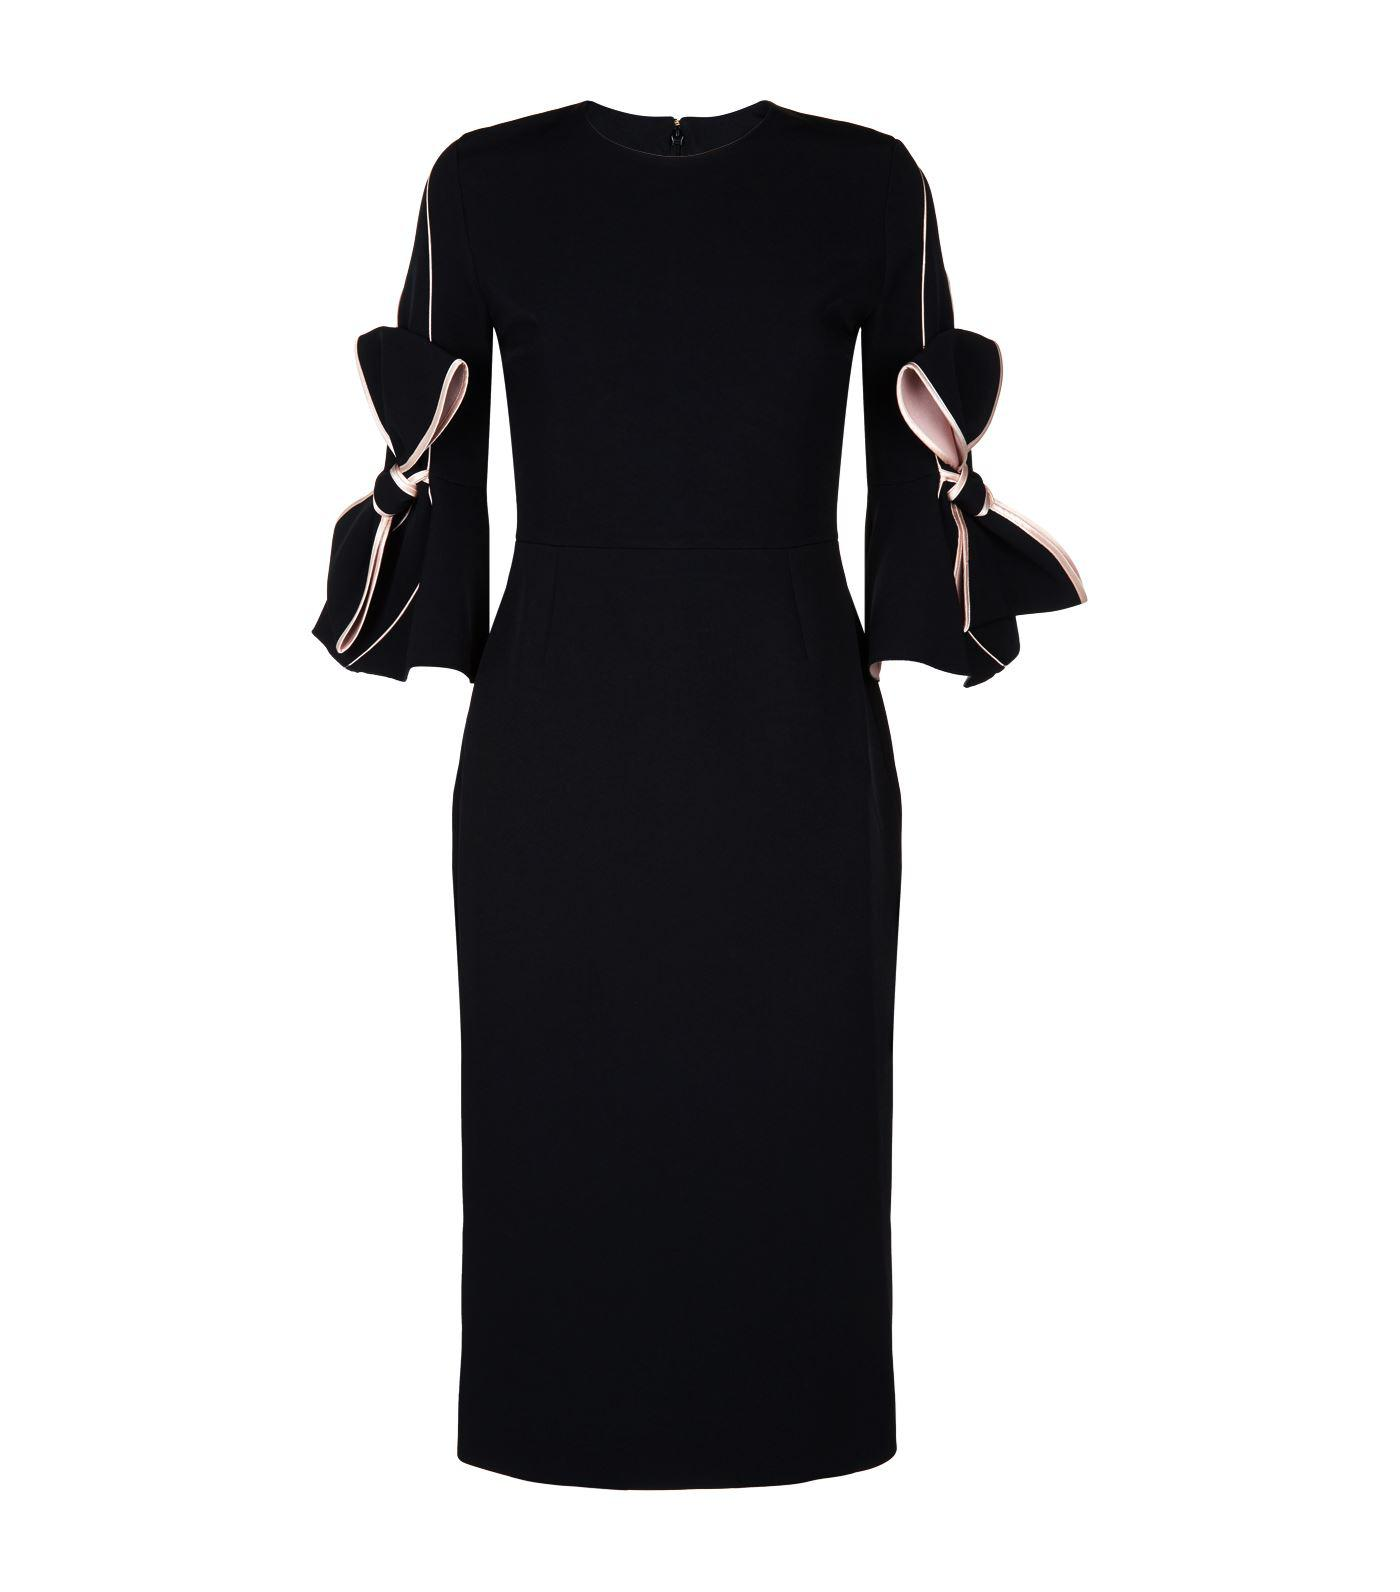 079a10ff4802 Lyst - ROKSANDA Lavete Bow Sleeve Dress in Black